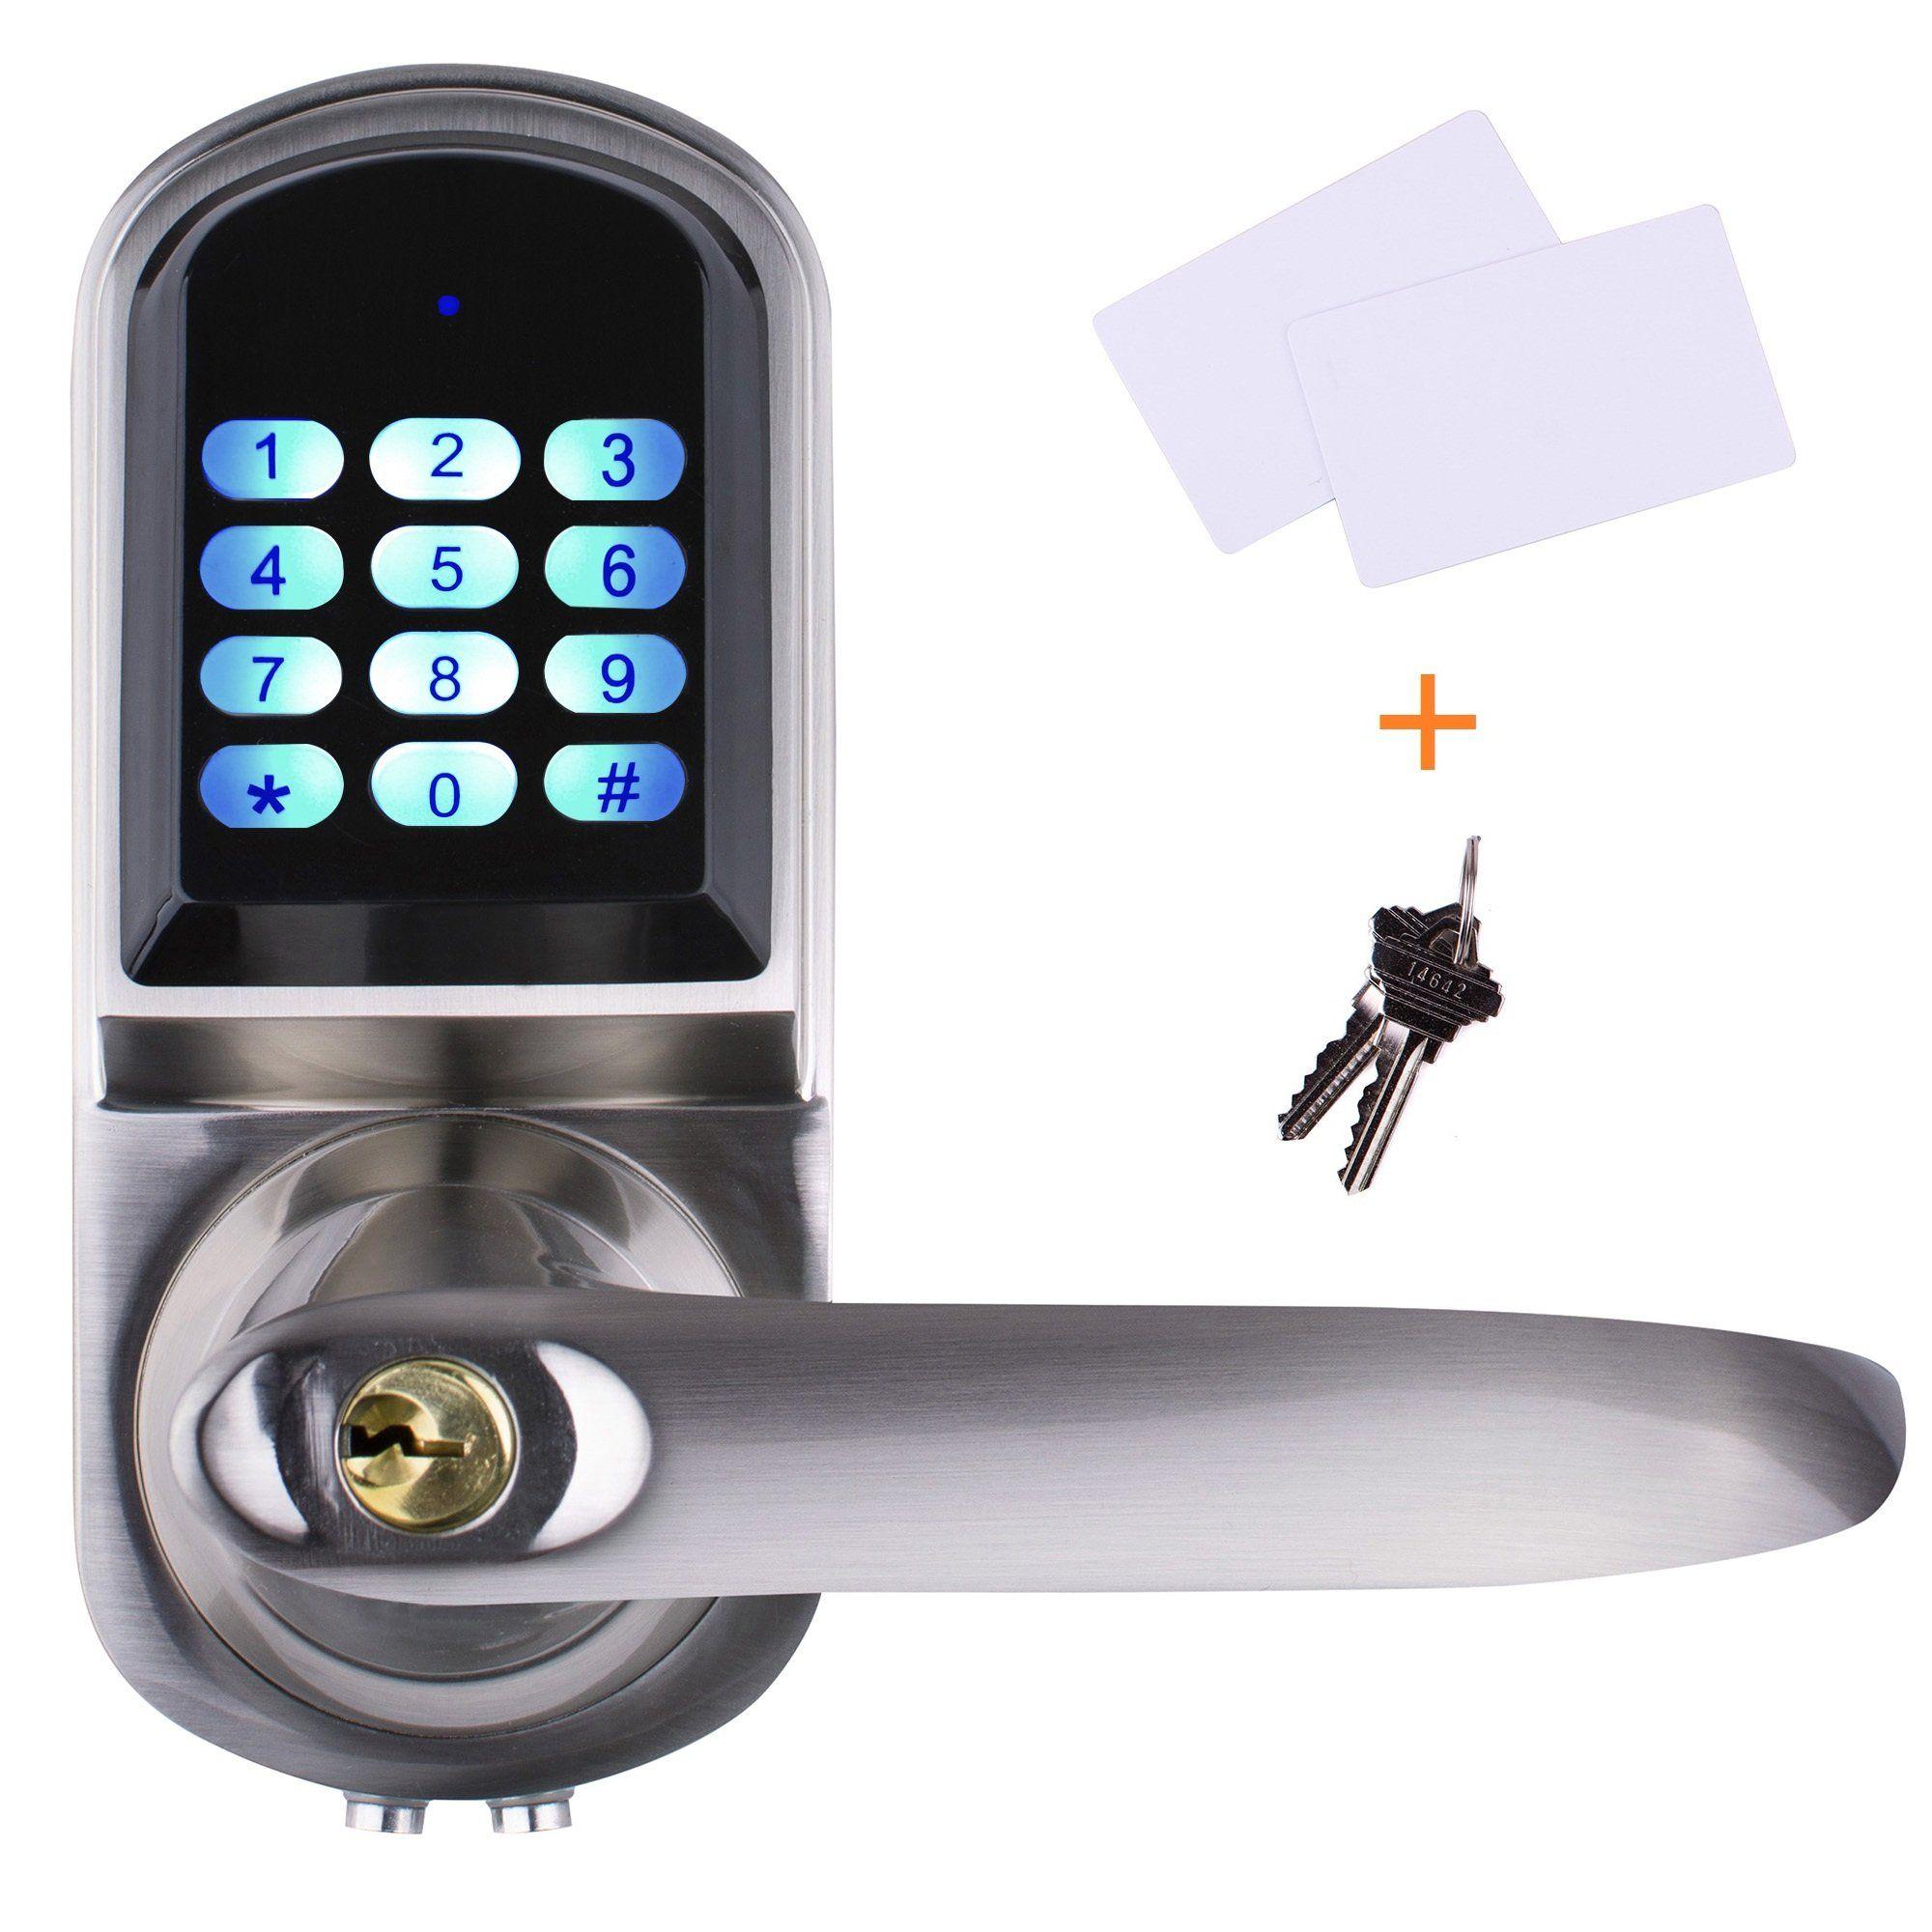 Ezlock Elc01 4 In 1 Electronic Keyless Backlit Keypad Door